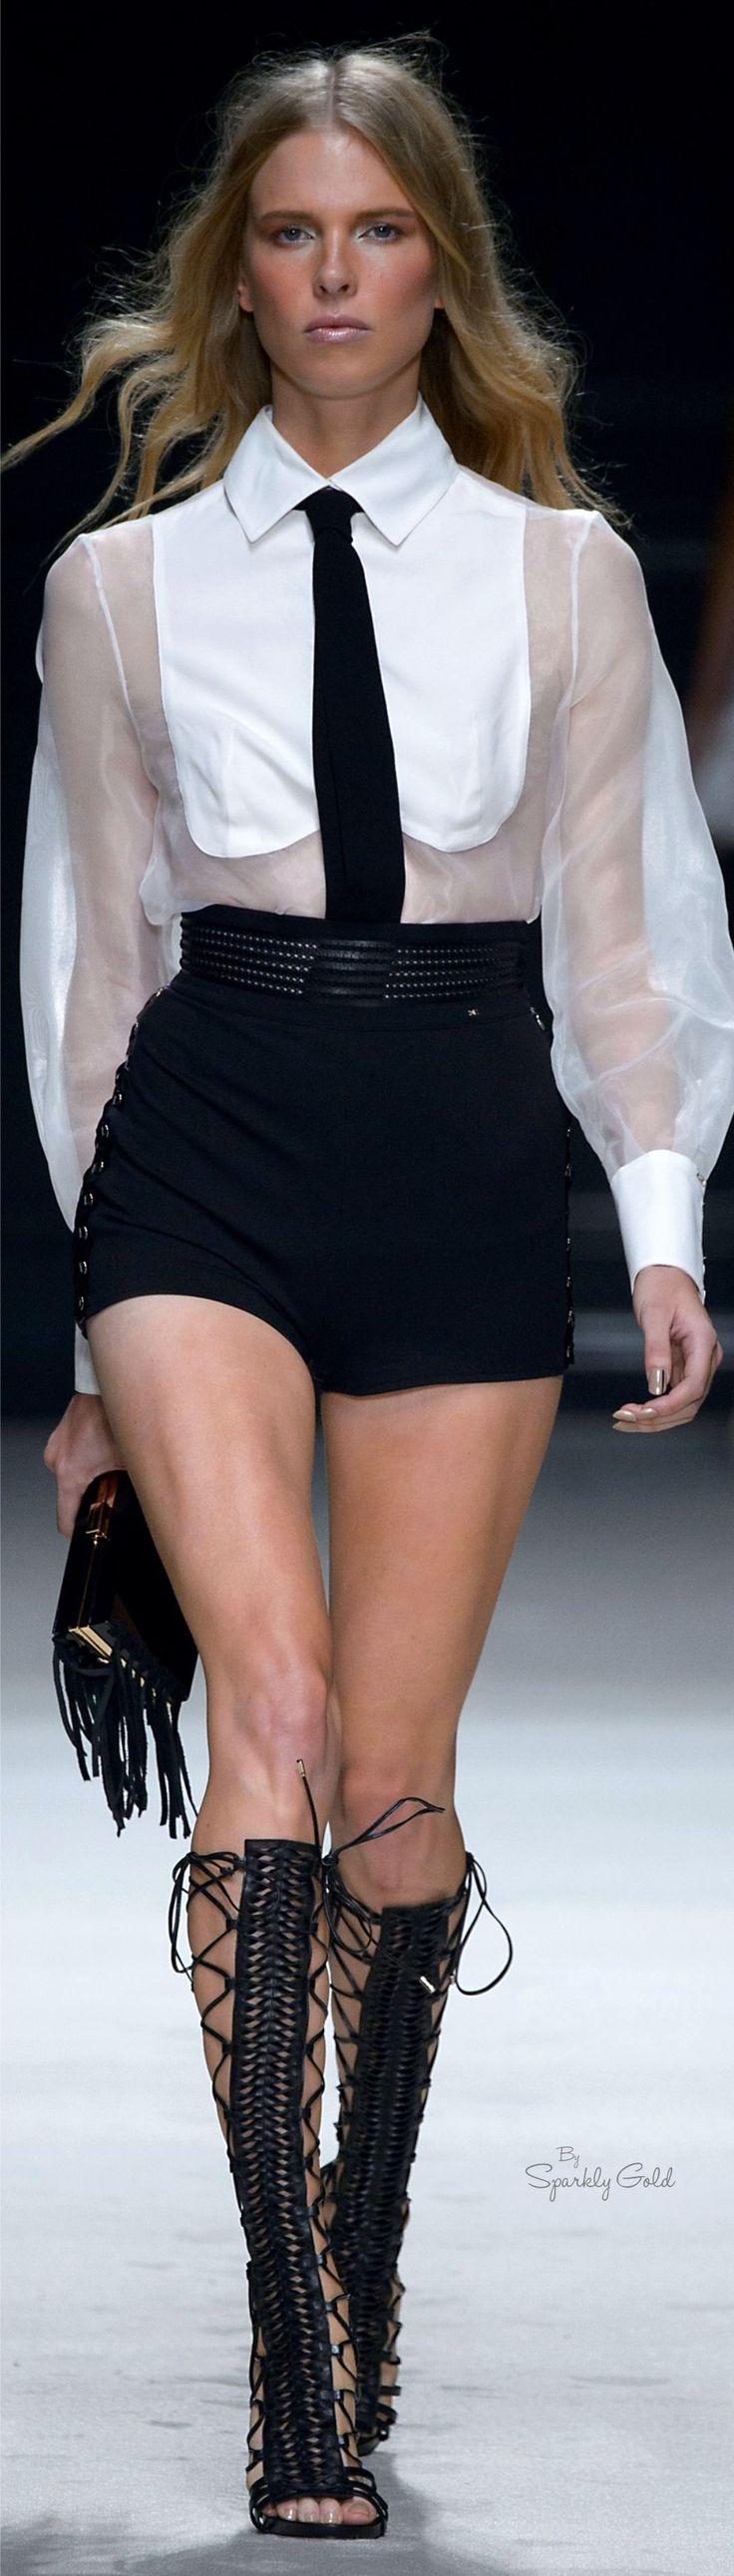 Elisabetta Franchi S-16 RTW: white blouse, black shorts.: